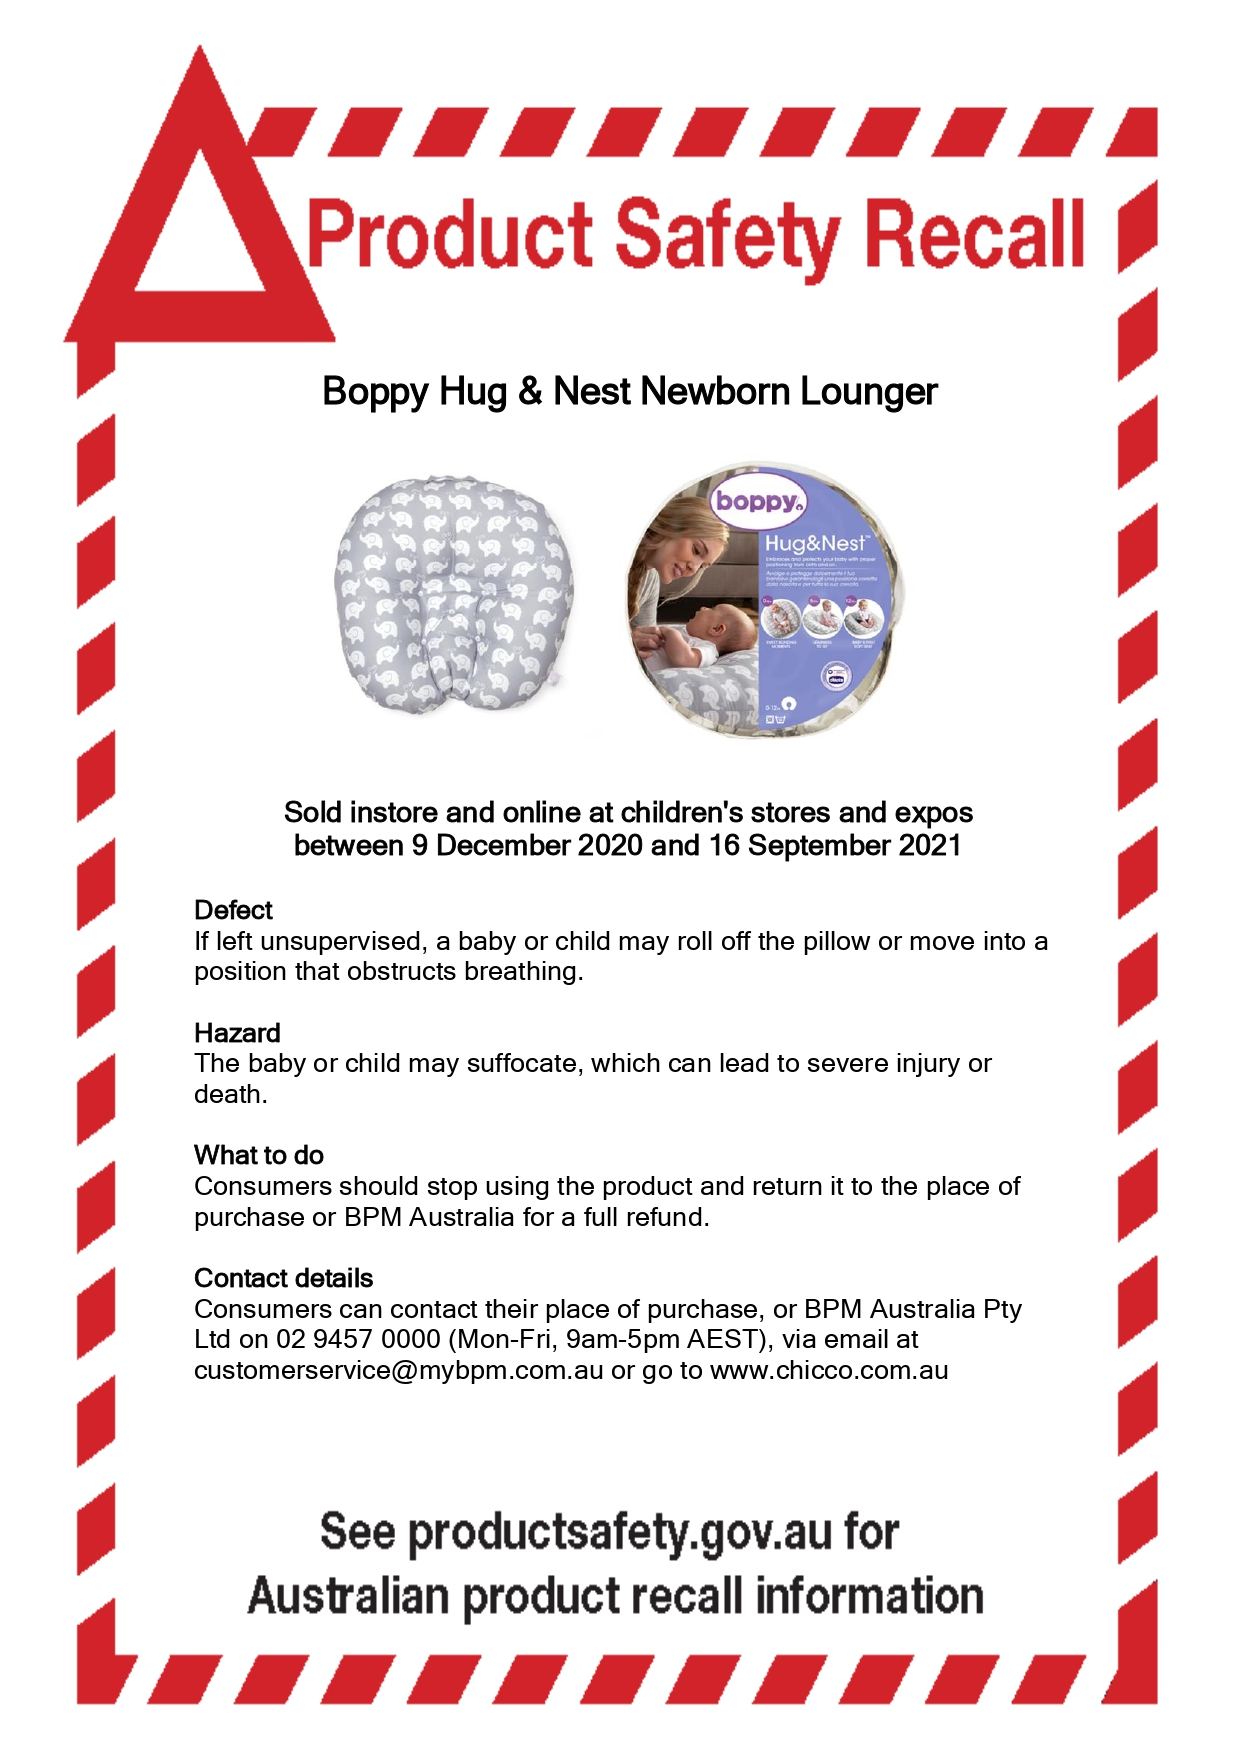 cps-mars-pra2021-19205-bpm-australia-pty-ltd-boppy-hug-nest-amended-recall-advertisement-v2-24-sept-21-12742406.2-page-0001.jpg